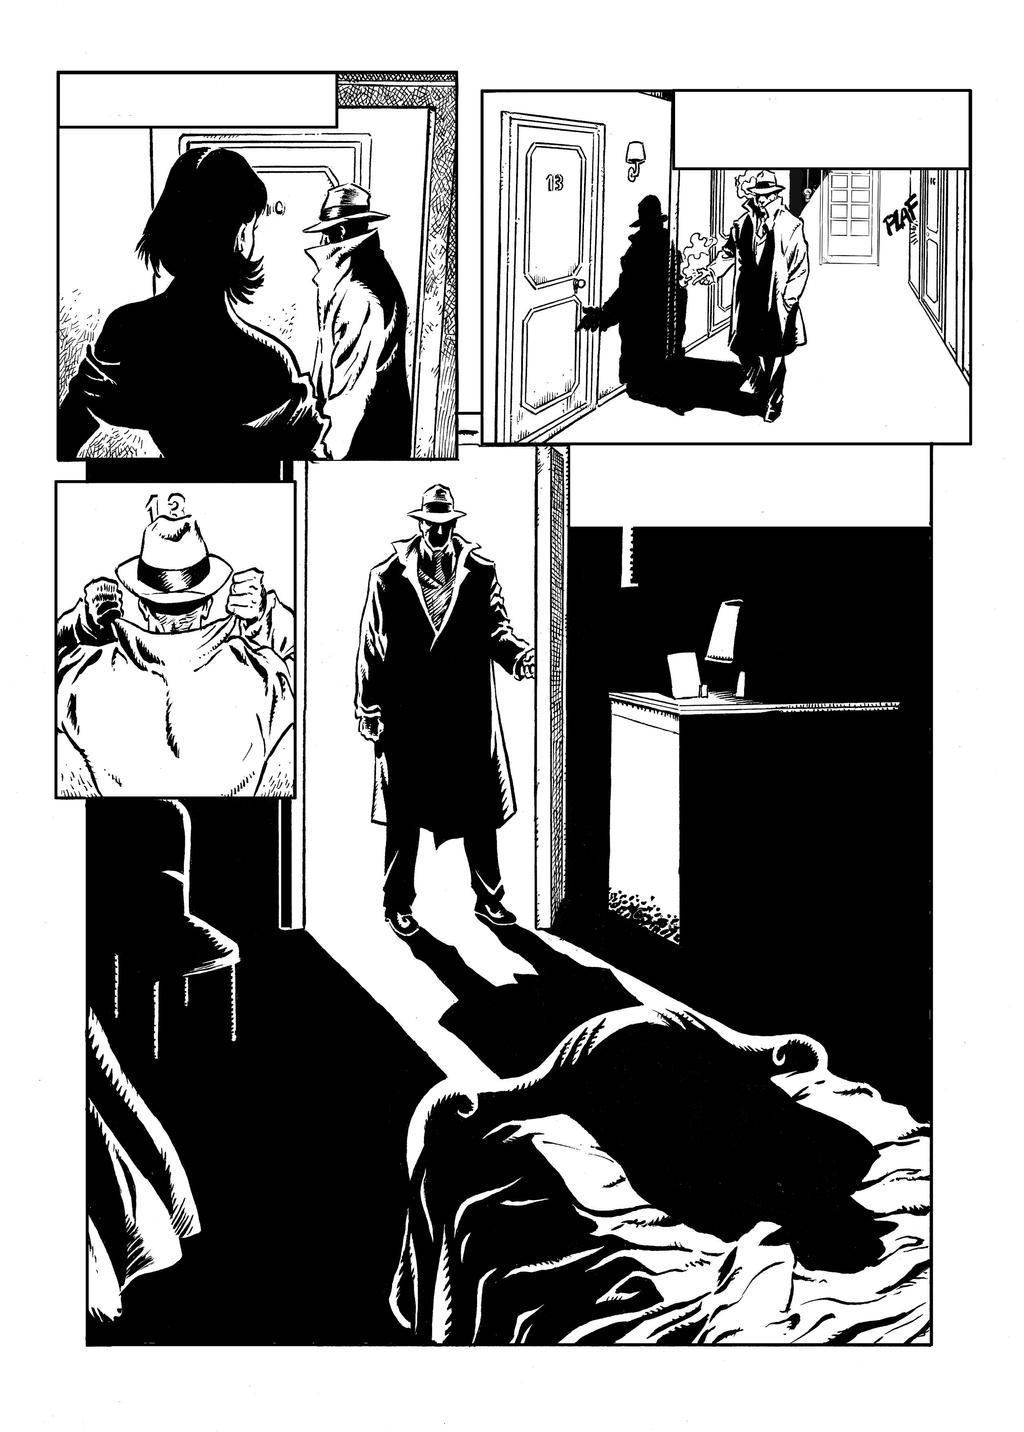 EL BATE PAGE 02 by SERGIOTARQUINI